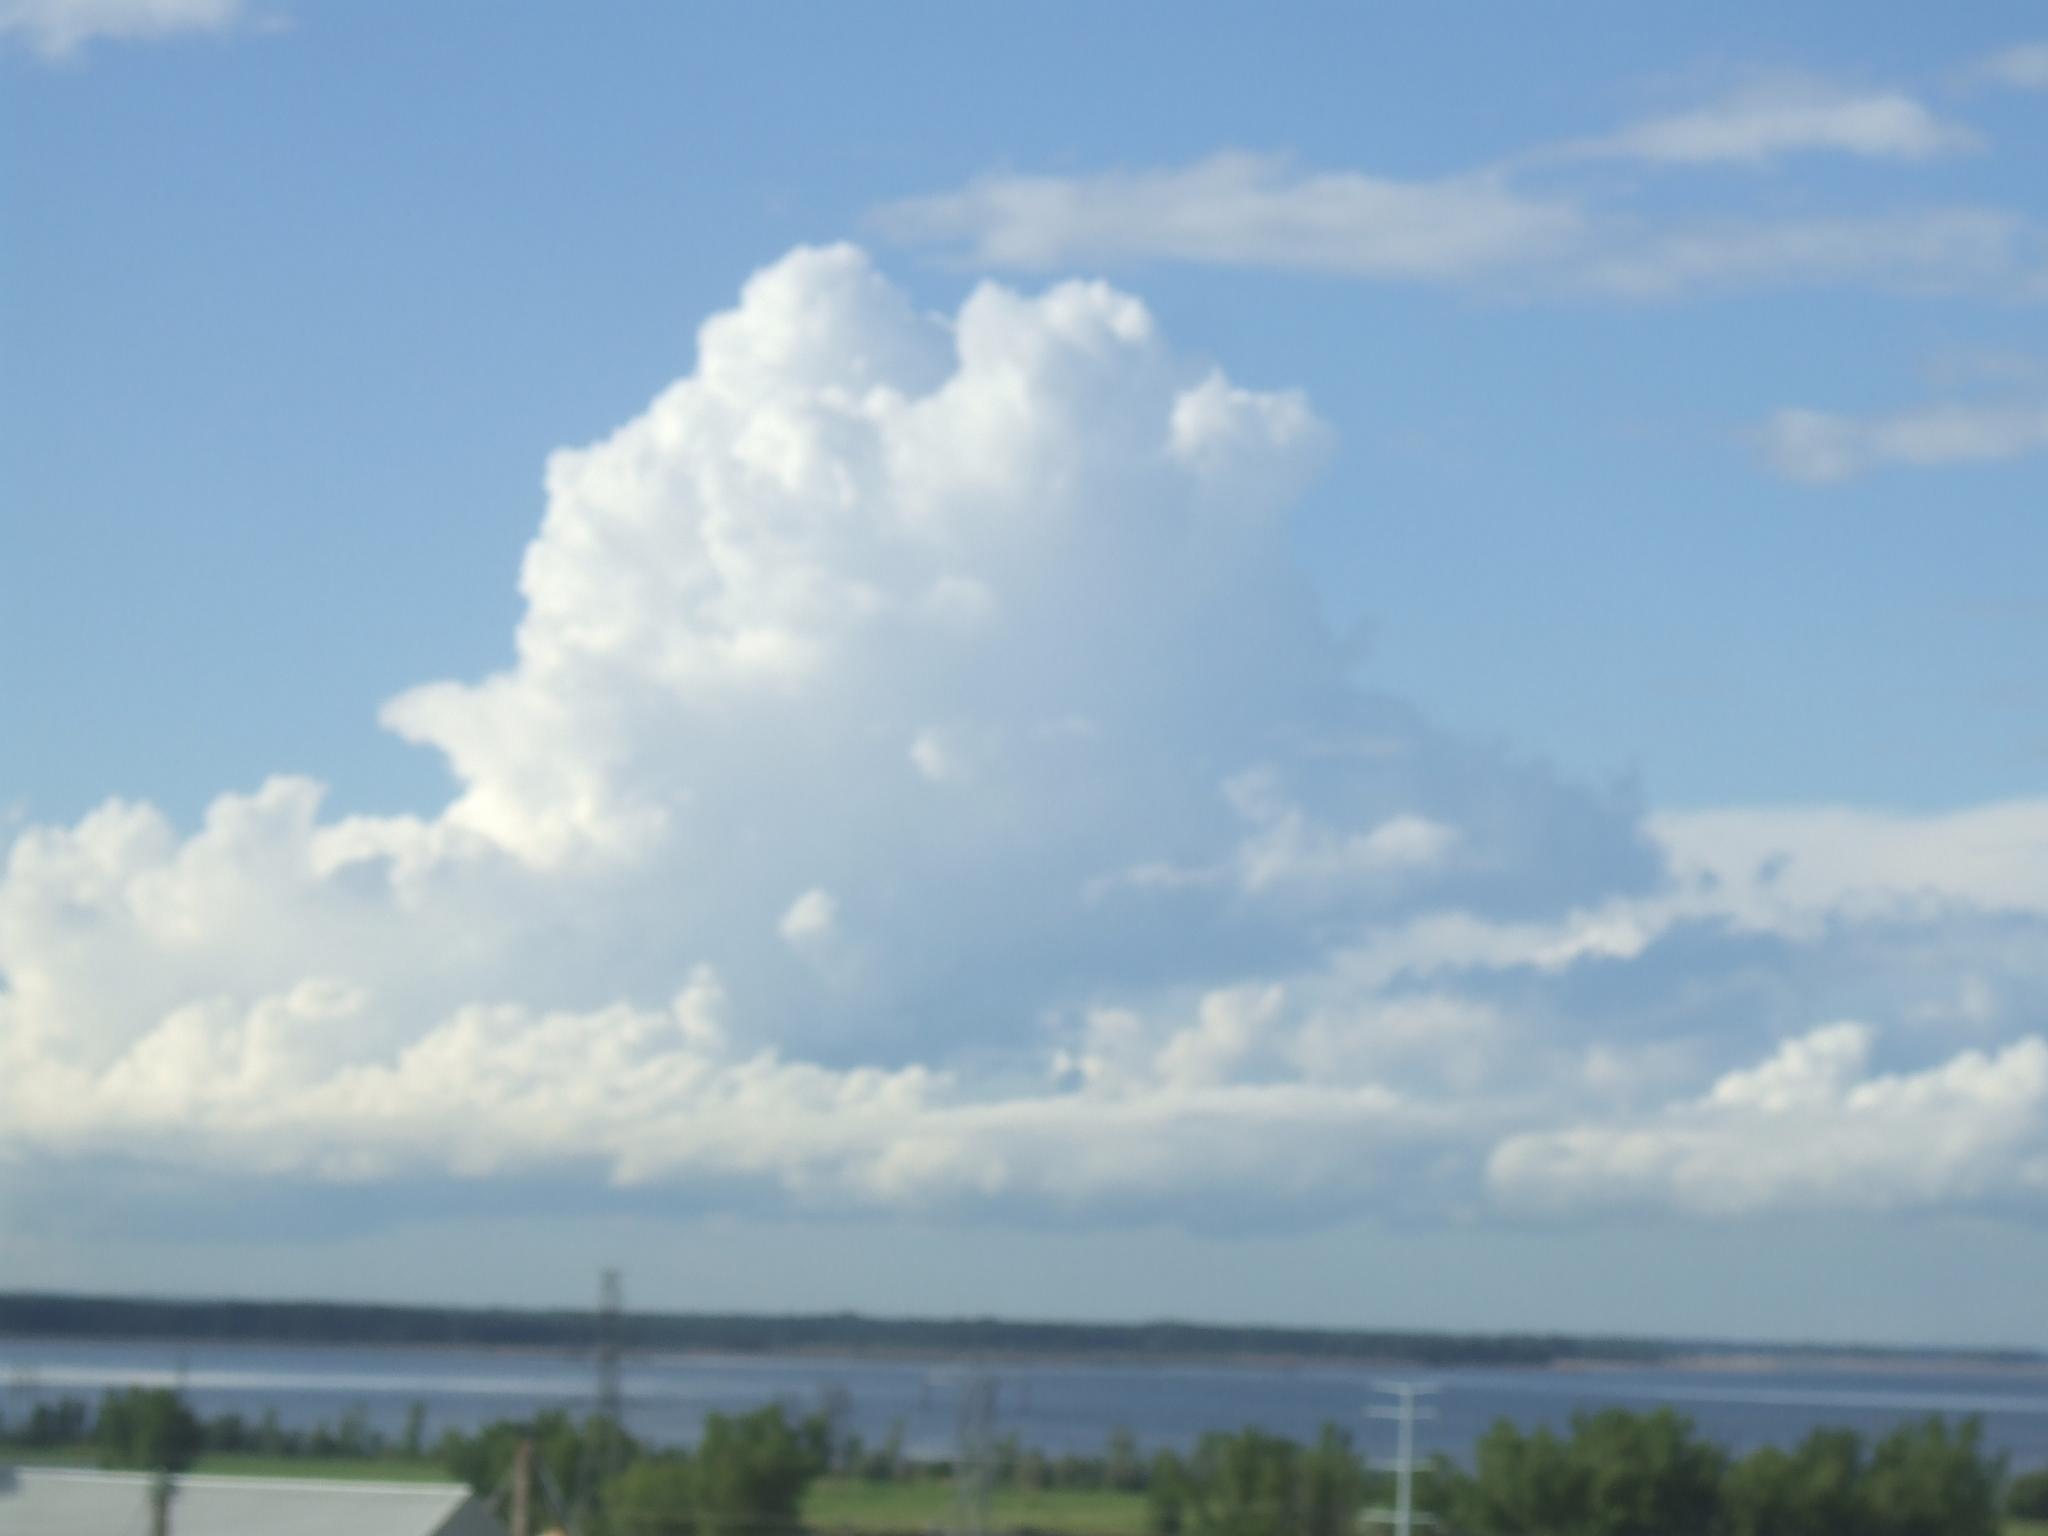 thunderhead clouds wallpaper - photo #14